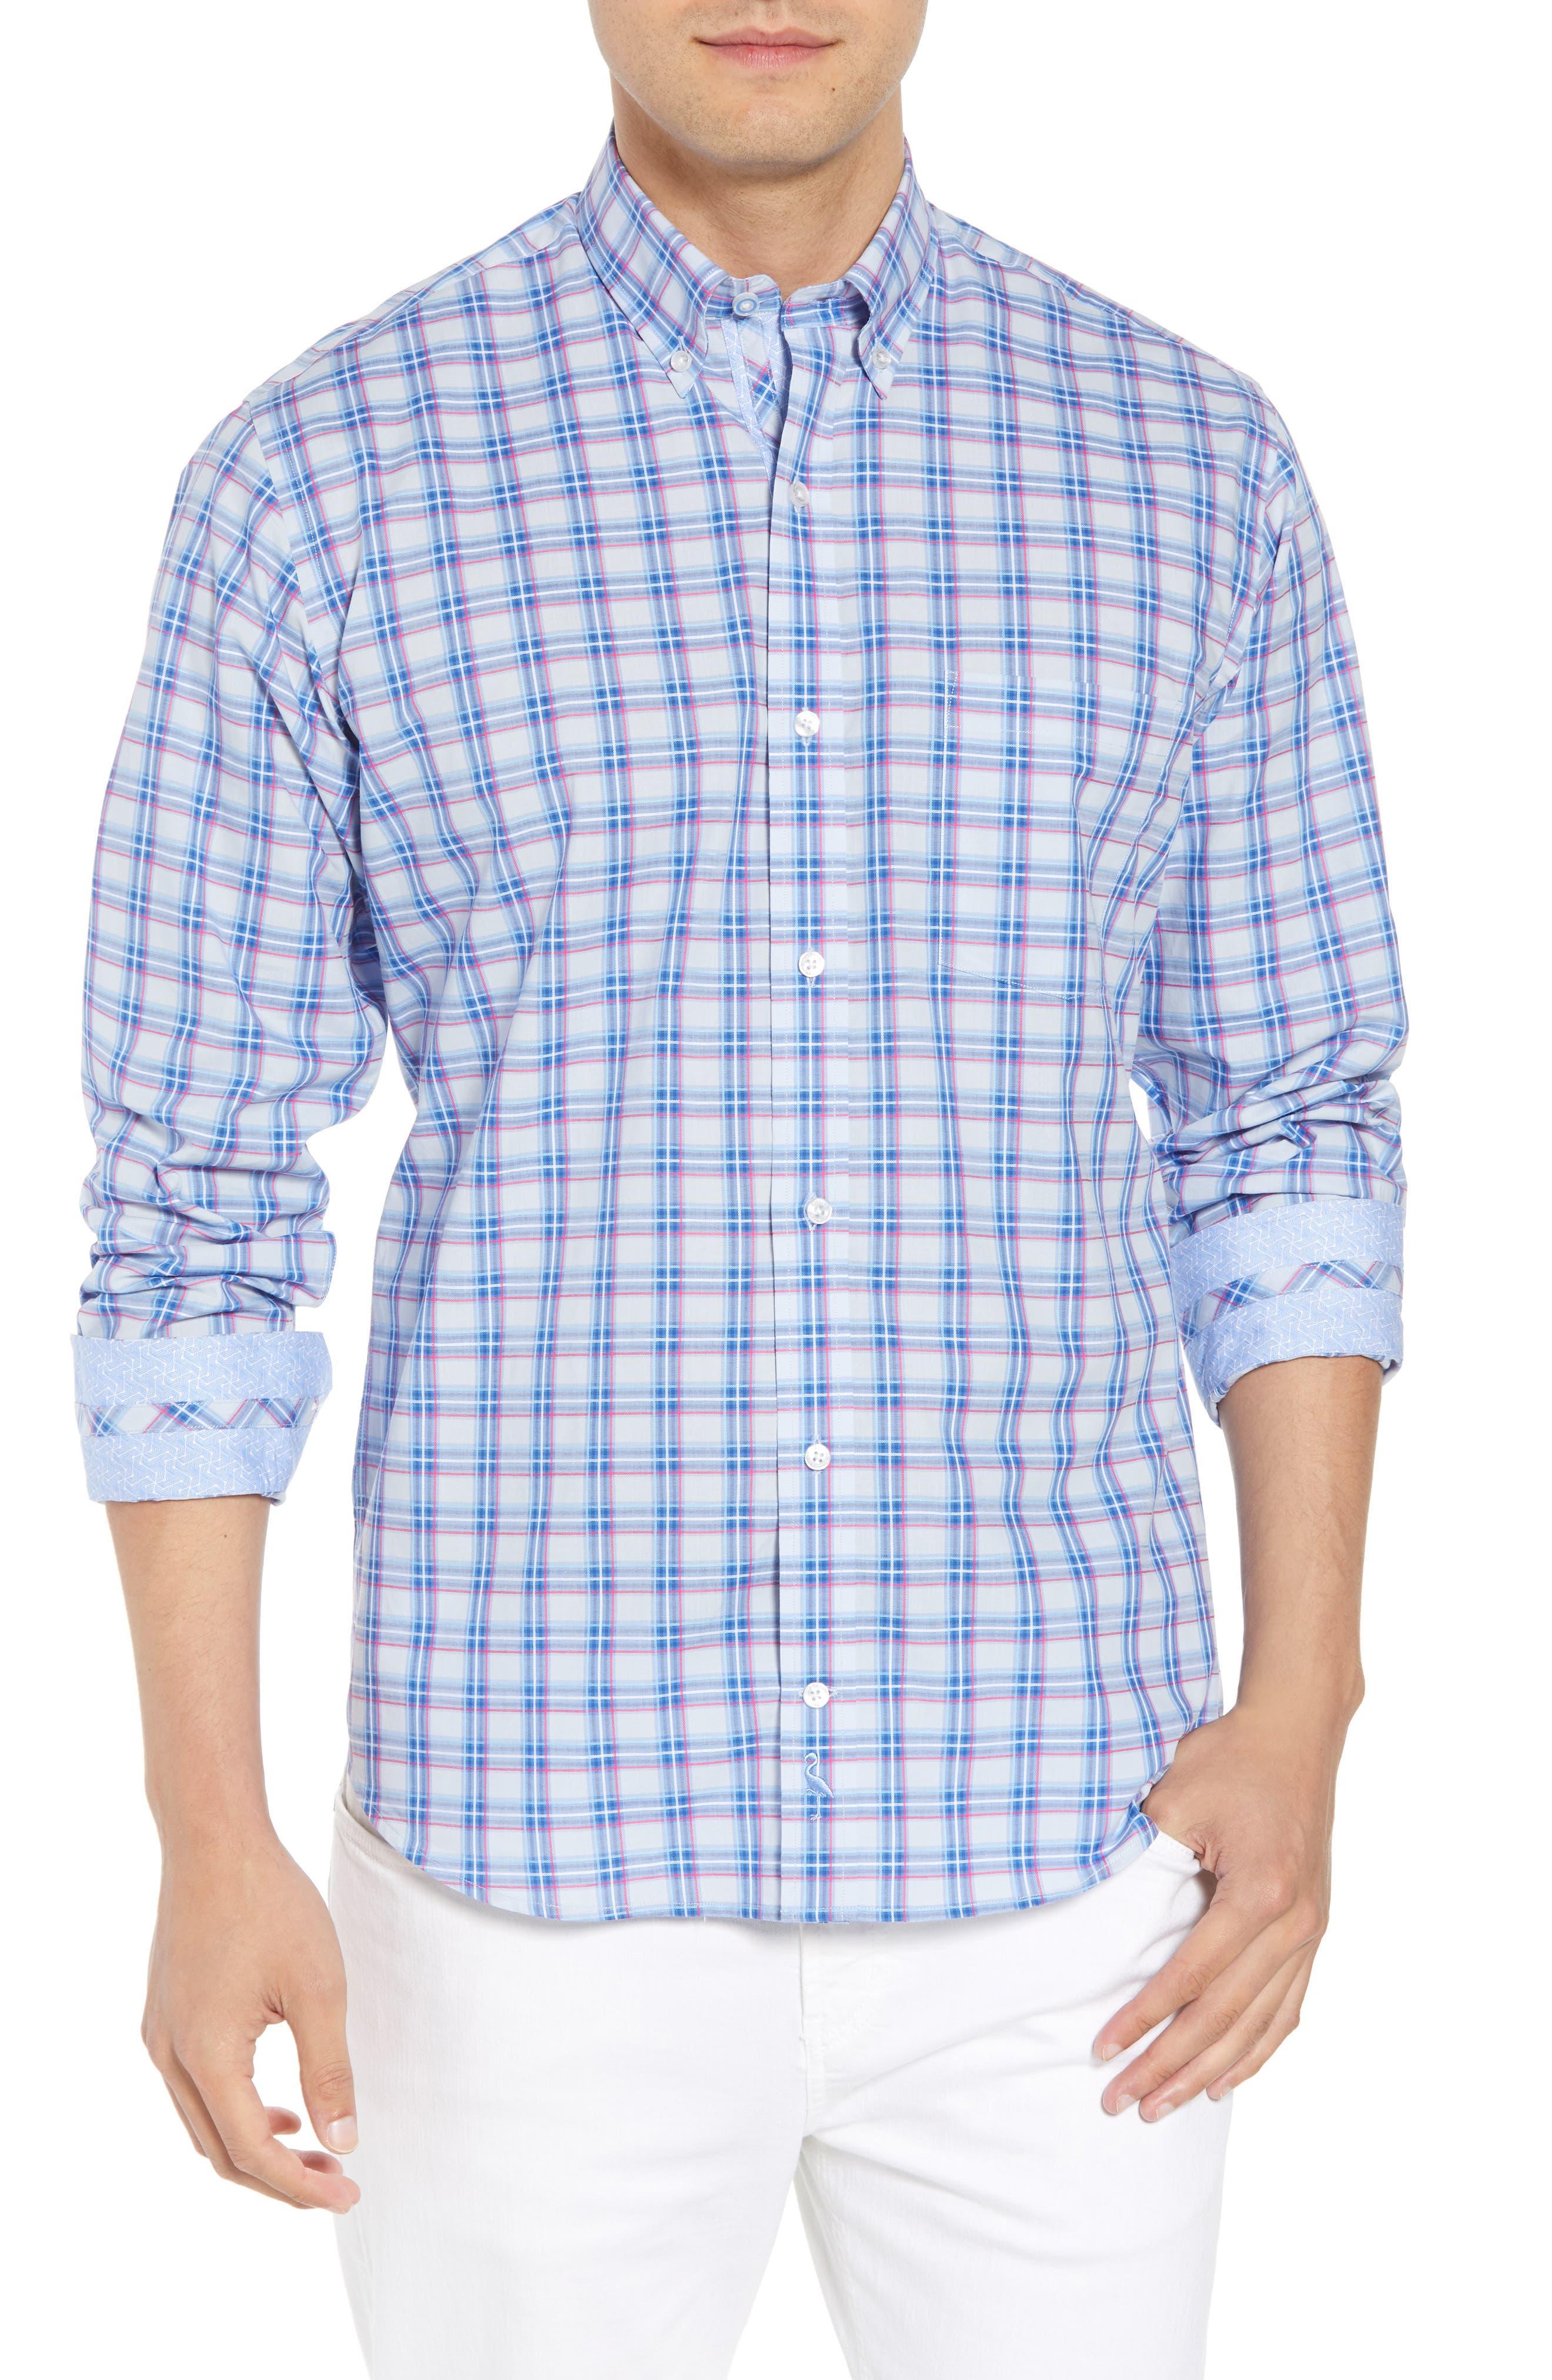 Alvaro Regular Fit Plaid Sport Shirt,                         Main,                         color, 450